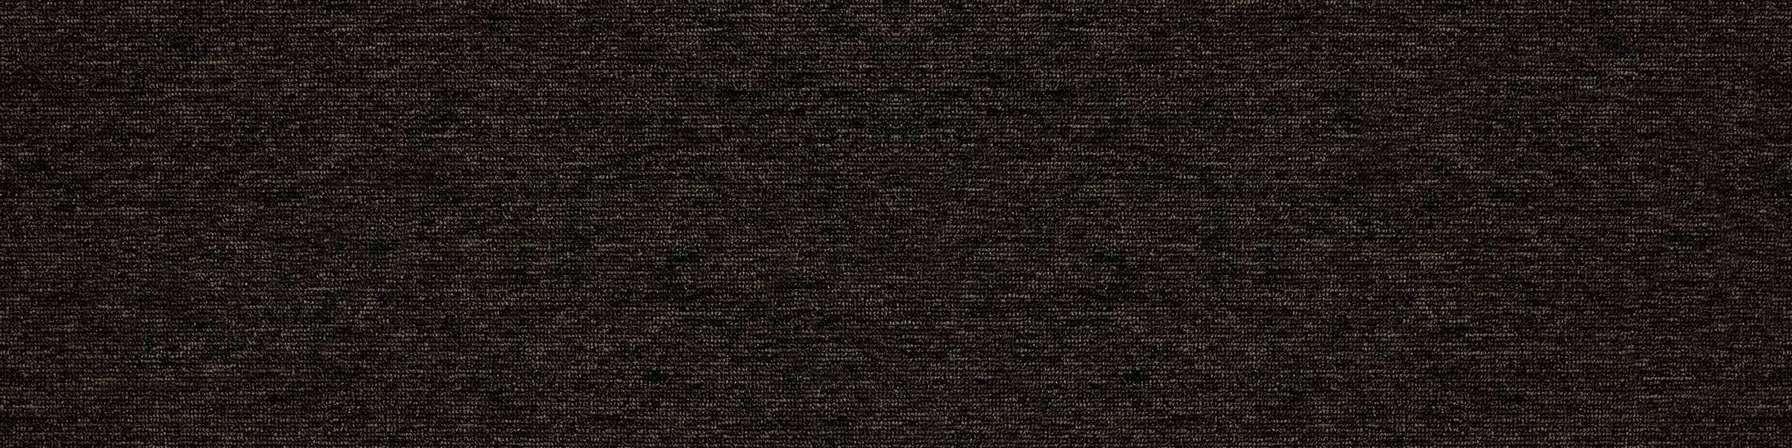 tivoli 21107 st lucia night carpet plank